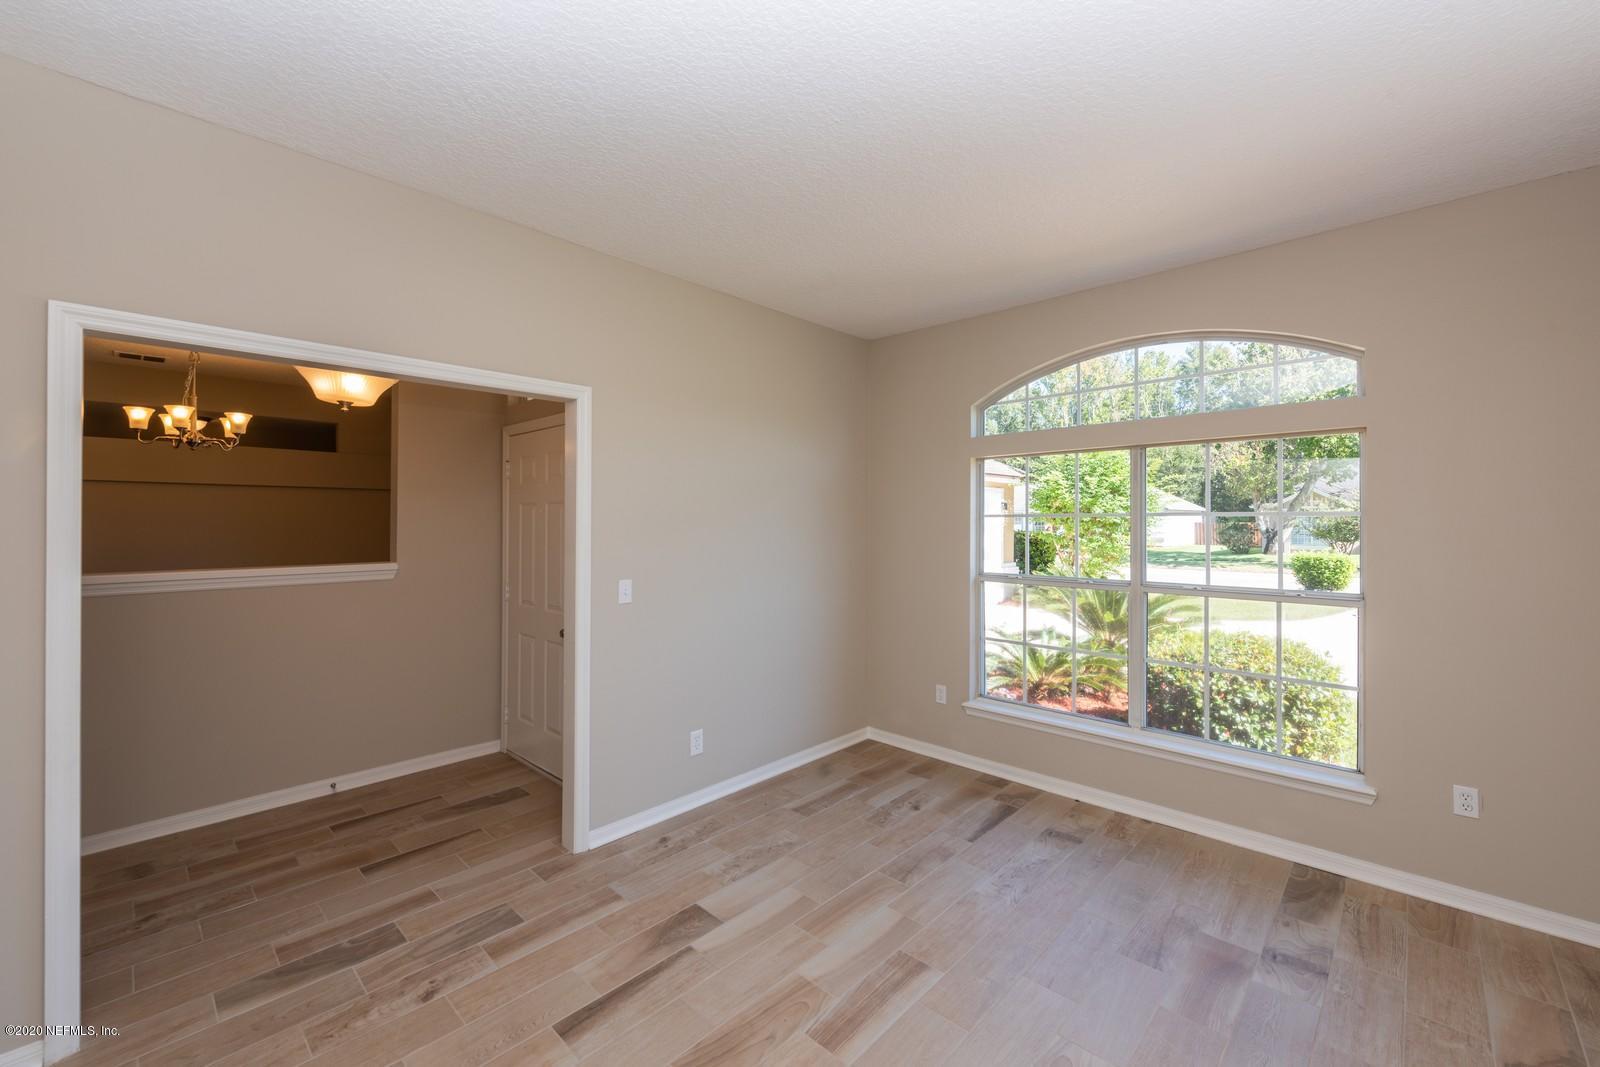 1524 MAPLE LEAF, FLEMING ISLAND, FLORIDA 32003, 4 Bedrooms Bedrooms, ,2 BathroomsBathrooms,Residential,For sale,MAPLE LEAF,1082300